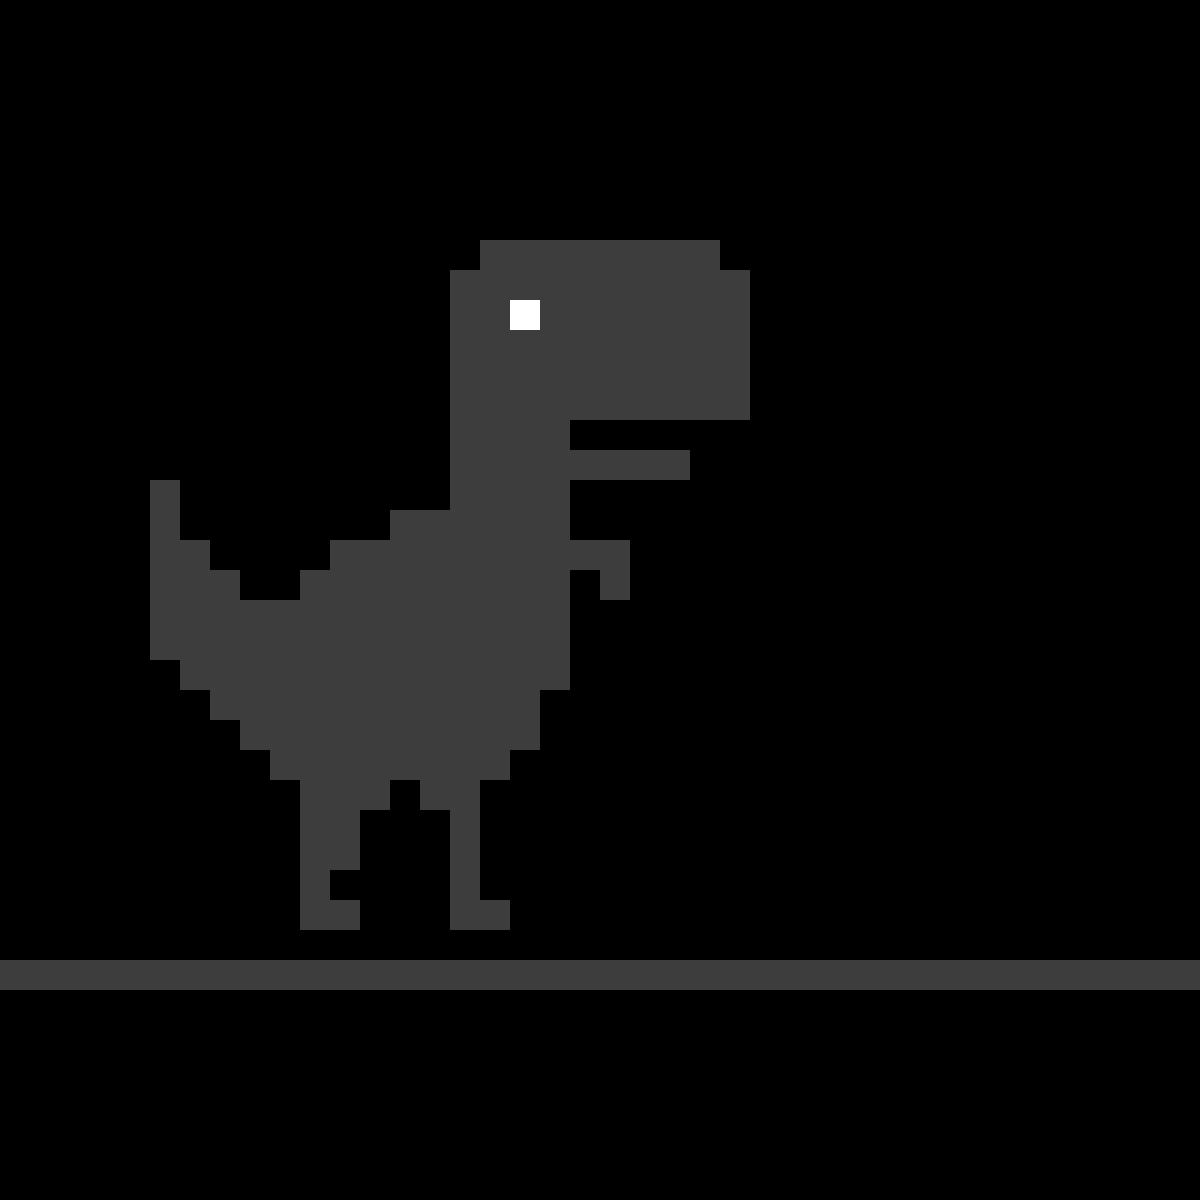 Dinosaur by levi-max-miller